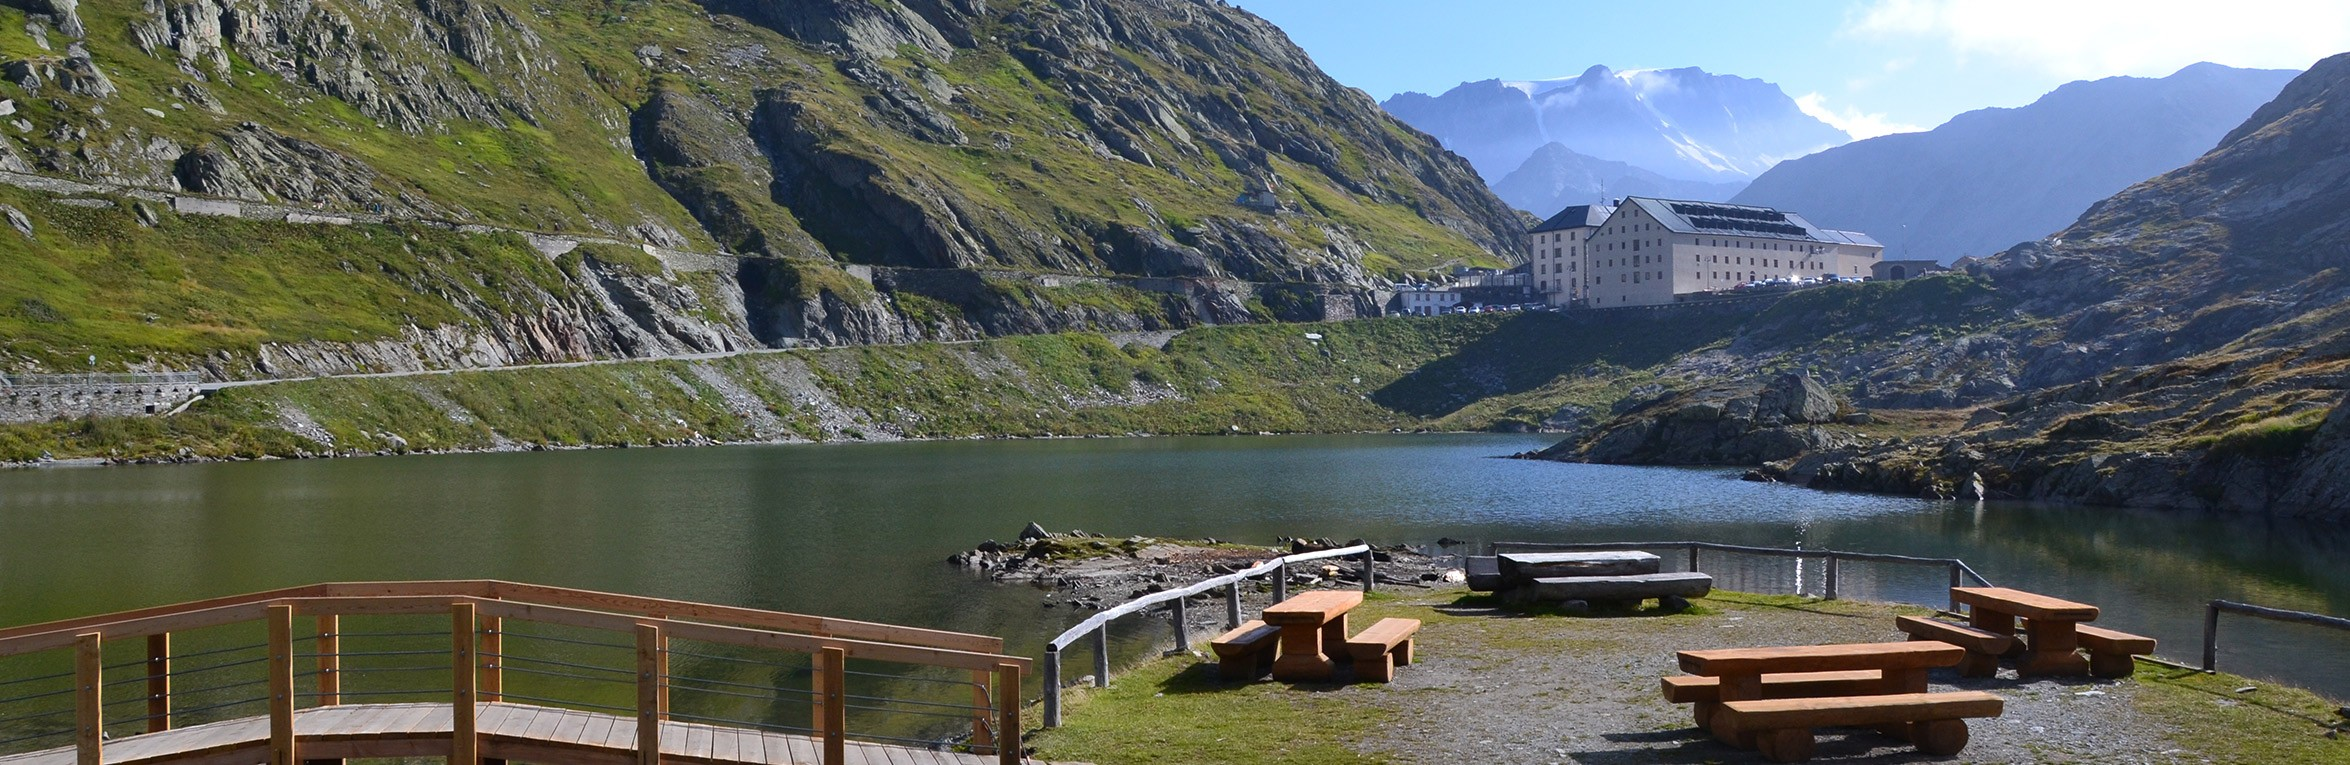 Col Gd Saint-Bernard Topos Guides Suisse Itinérance